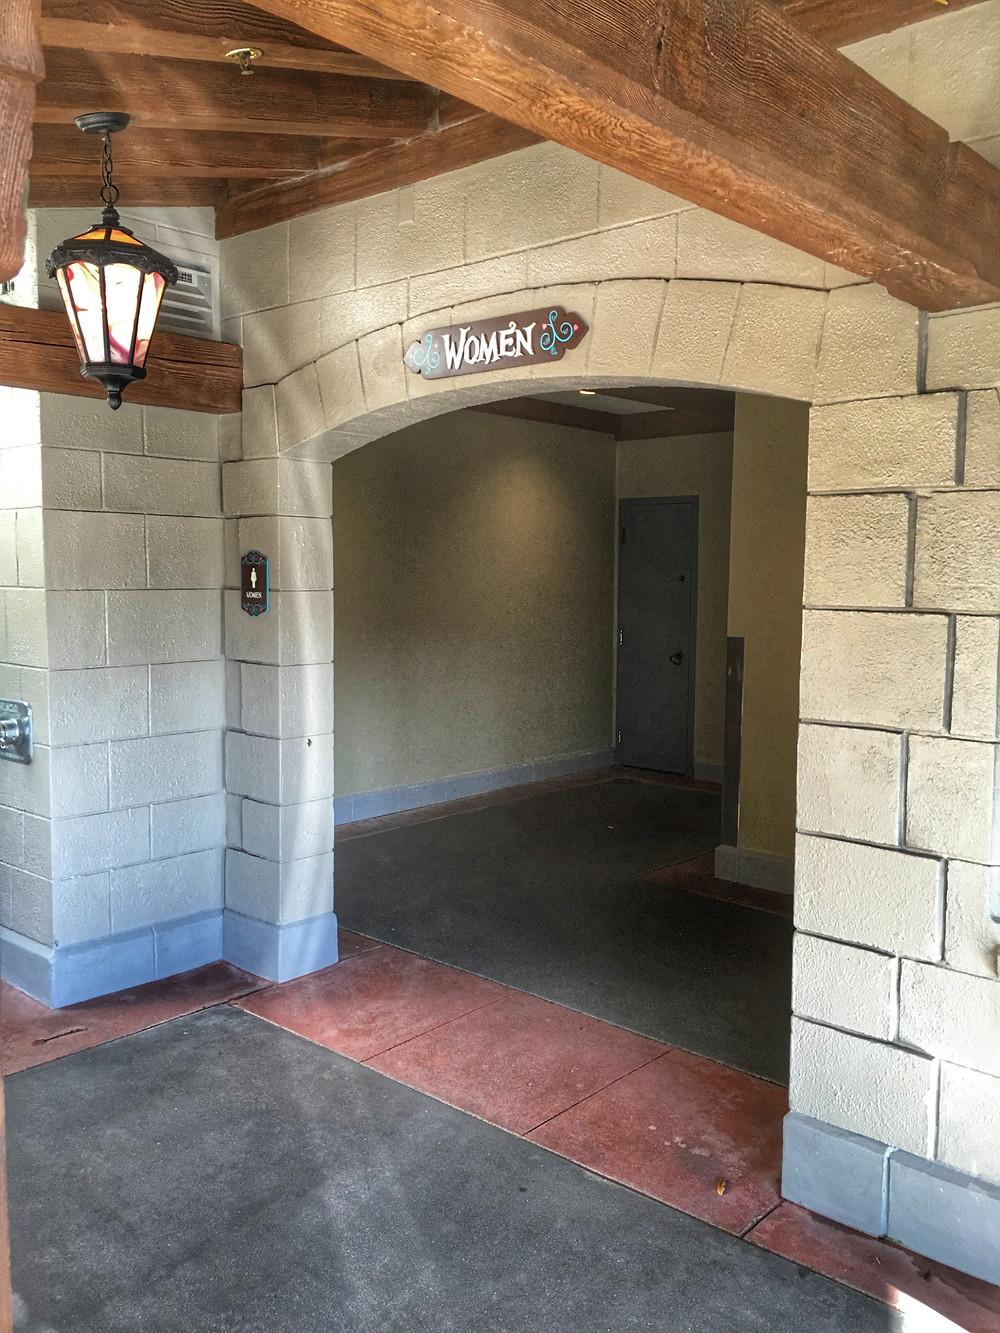 Entrance to Women's Loo, Cheshire Cafe, Magic Kingdom